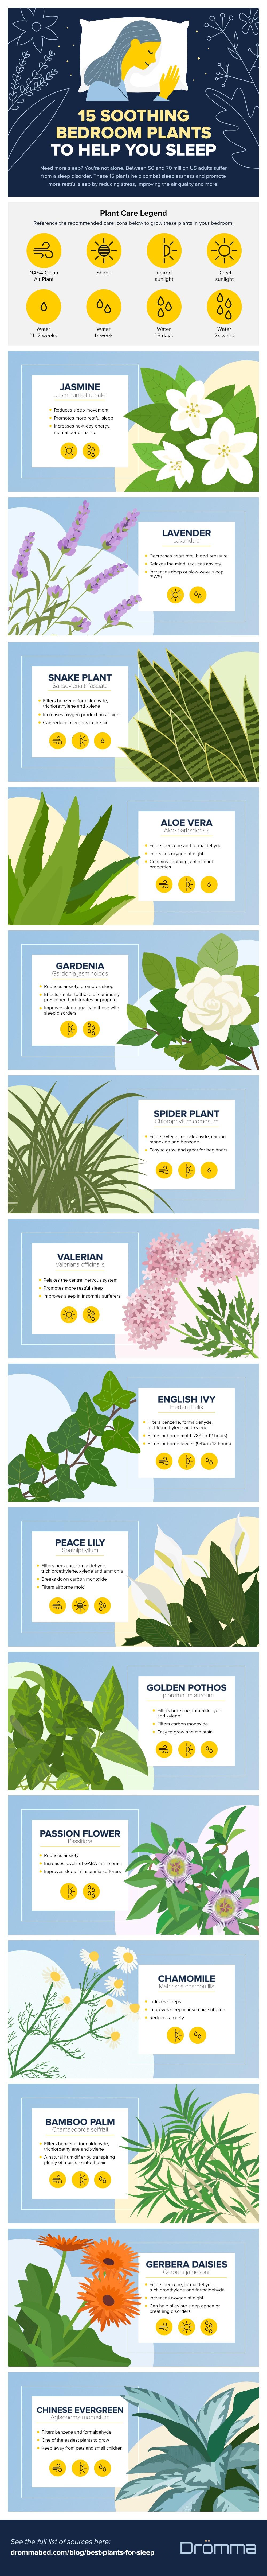 15 Indoor Plants that Help You Get a Good Night's Sleep